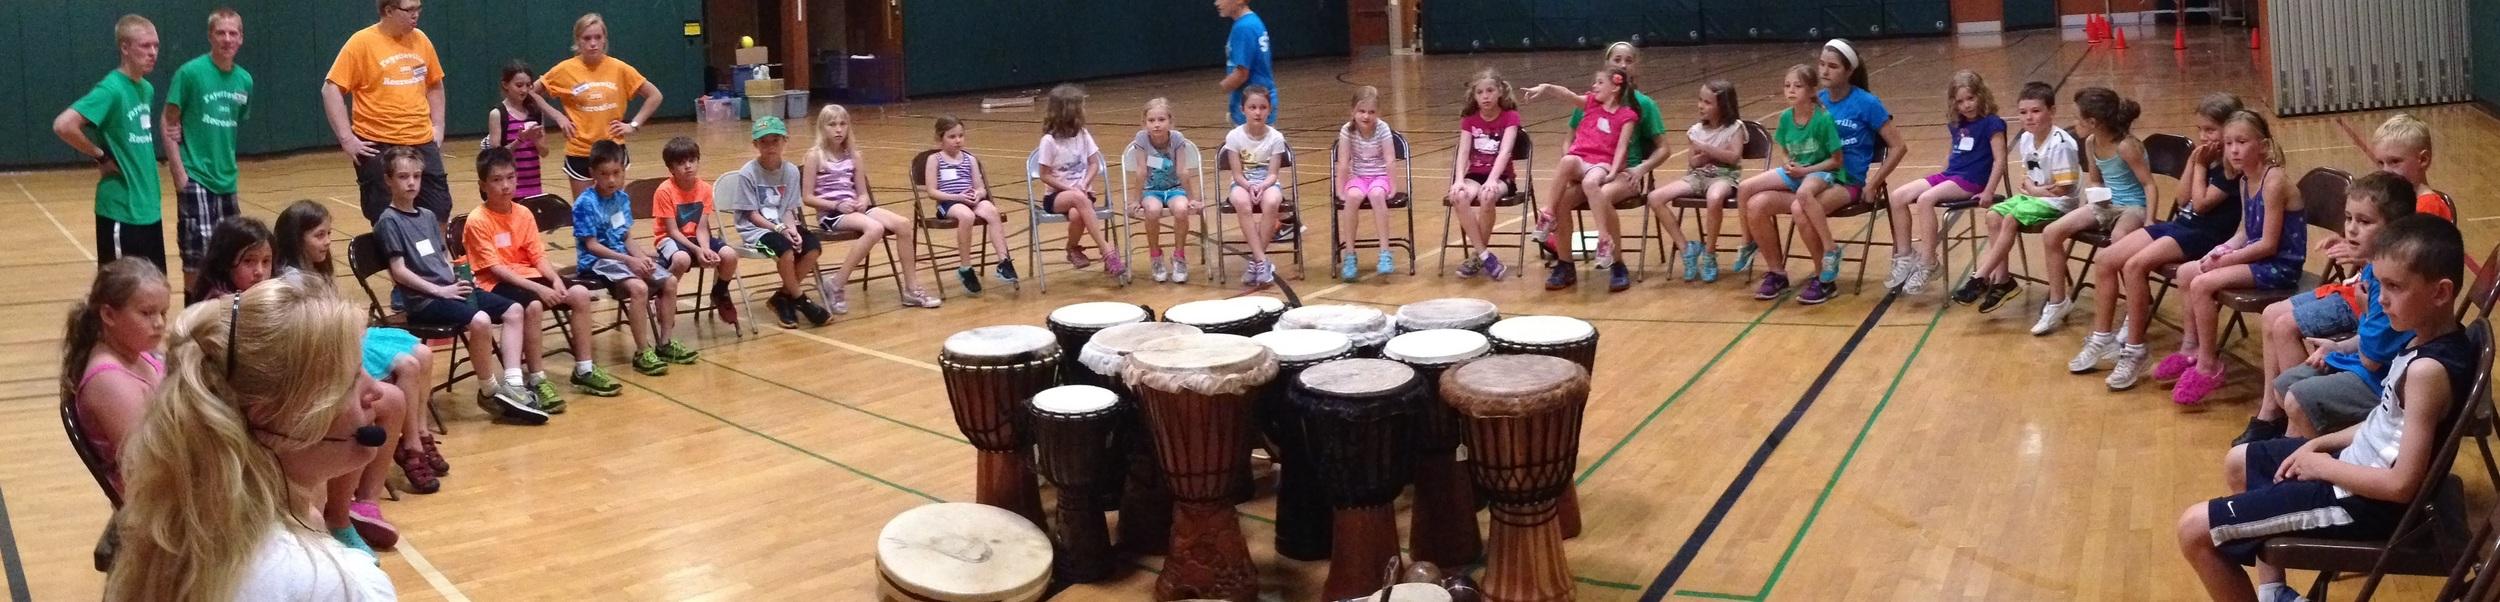 Fay Recreation Dept Drum Program.jpg